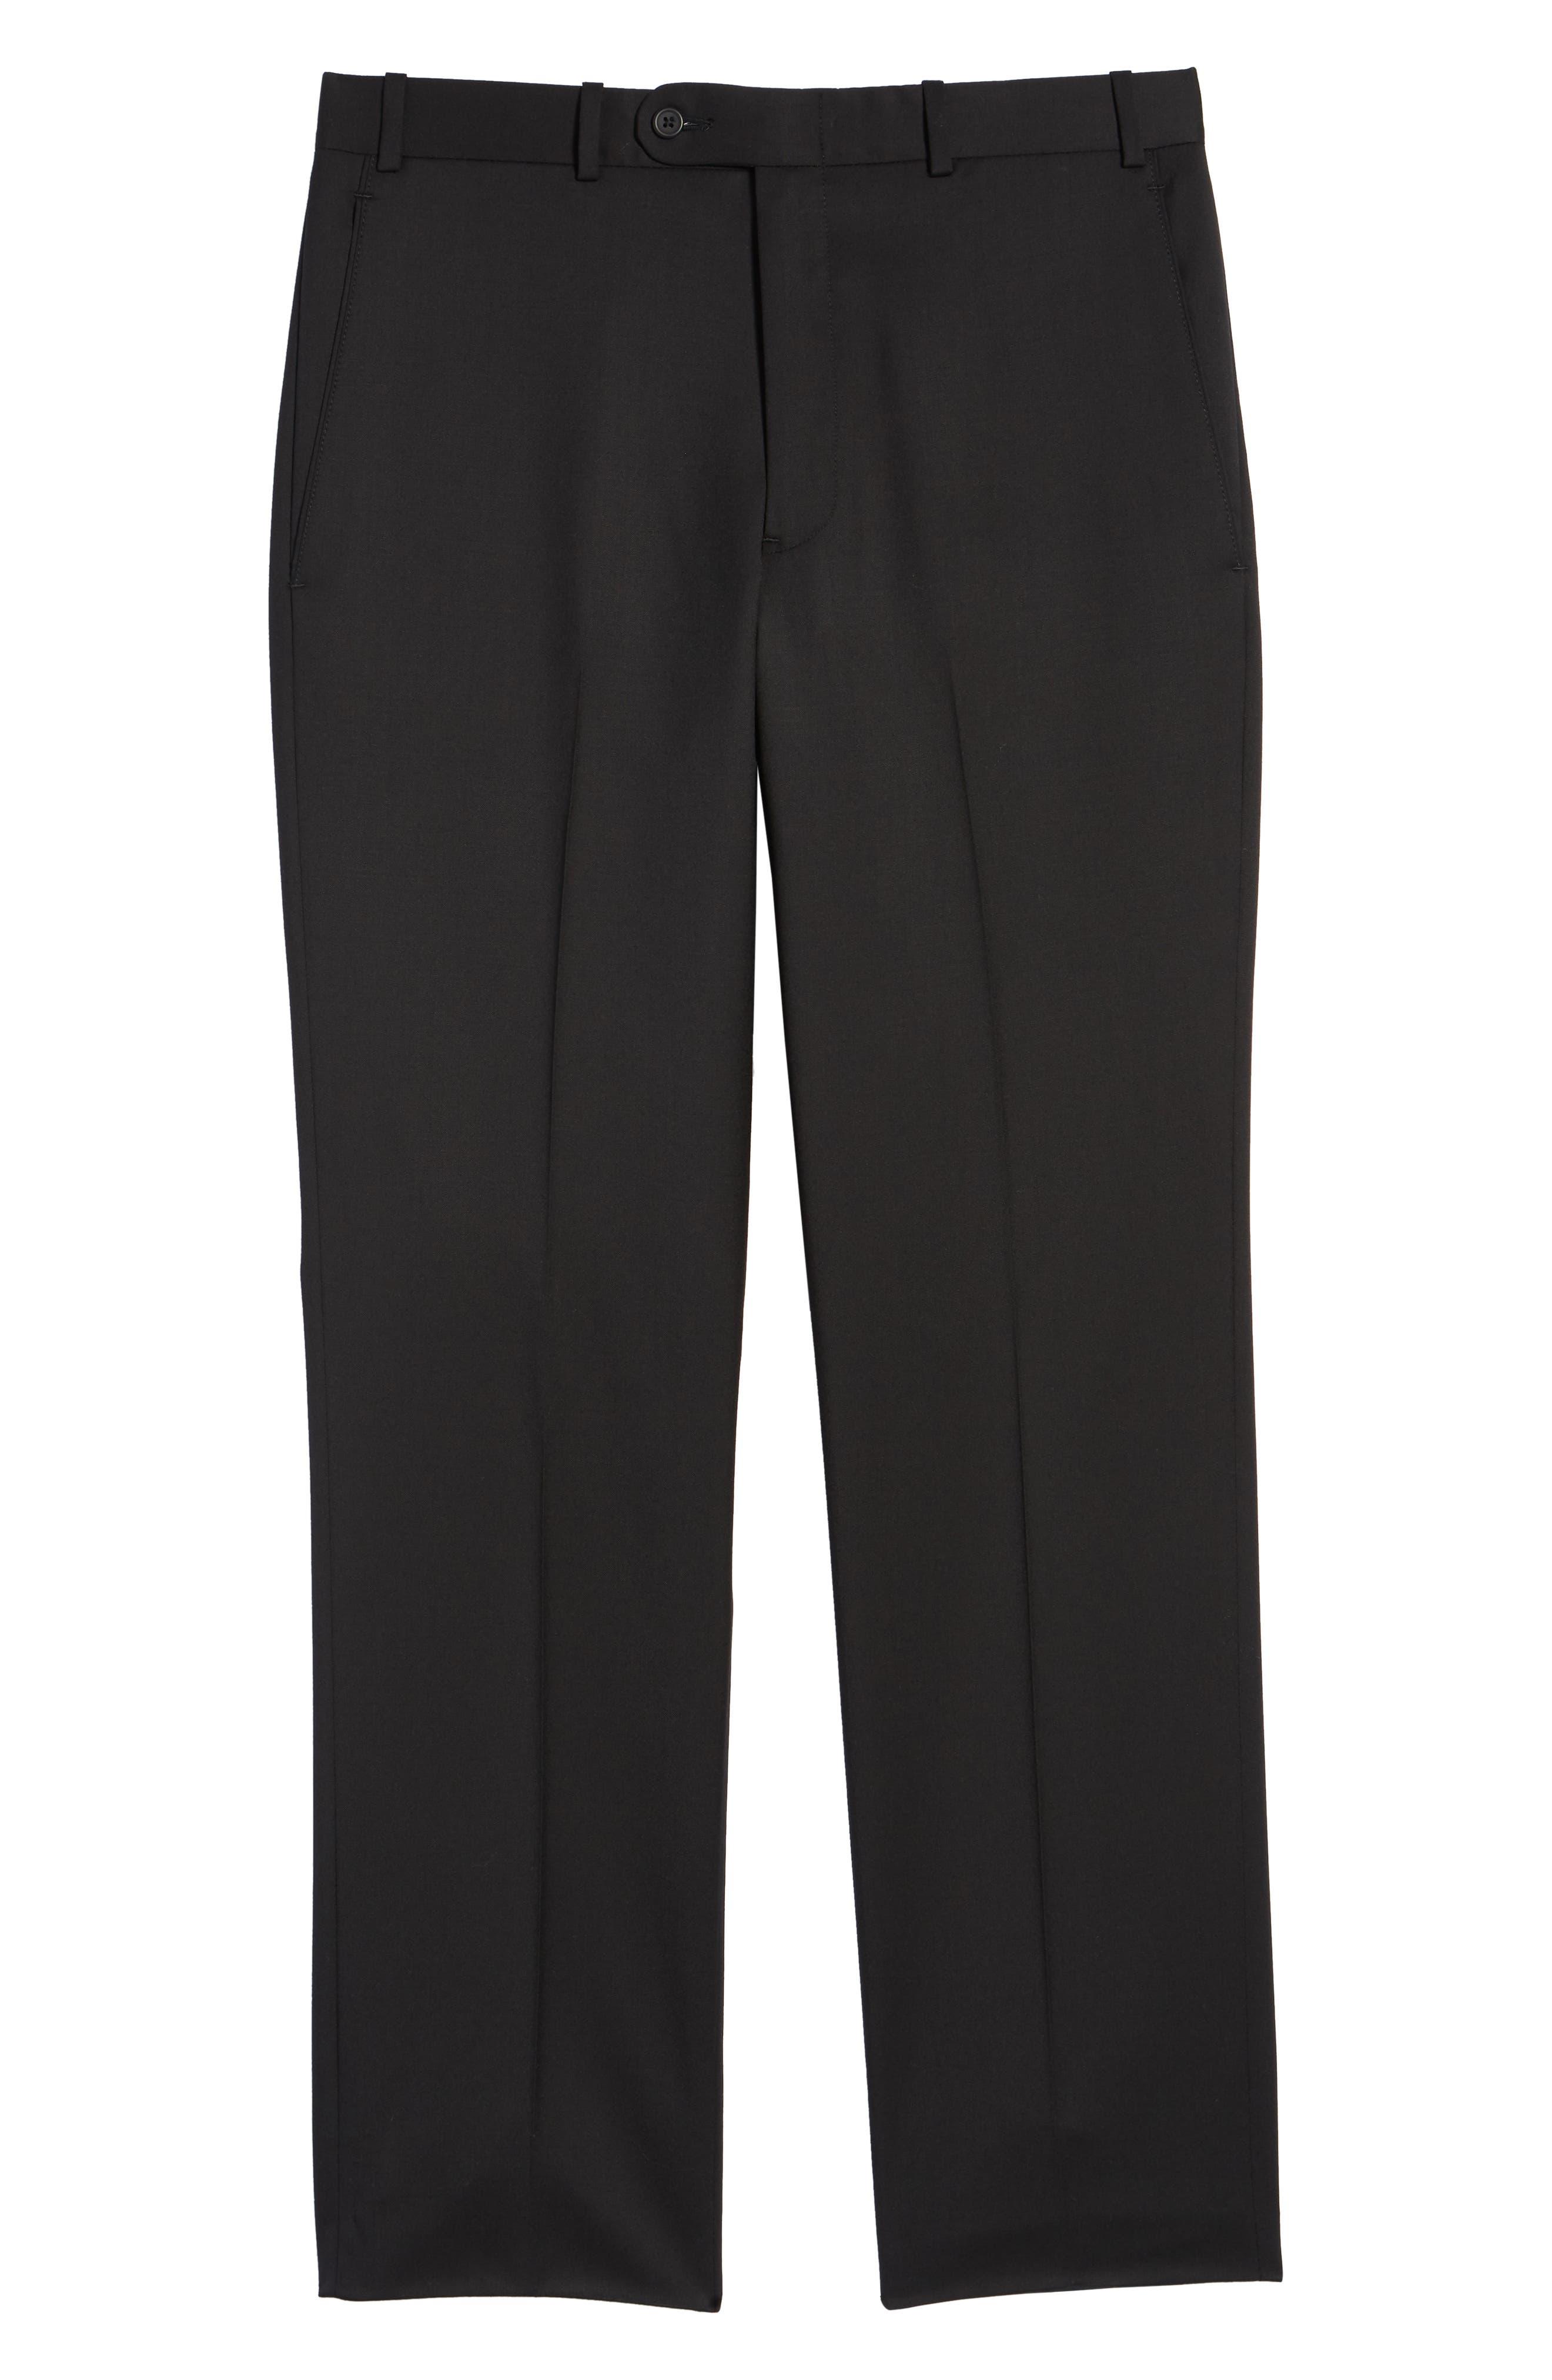 Torino Flat Front Wool Gabardine Trousers,                             Alternate thumbnail 6, color,                             001